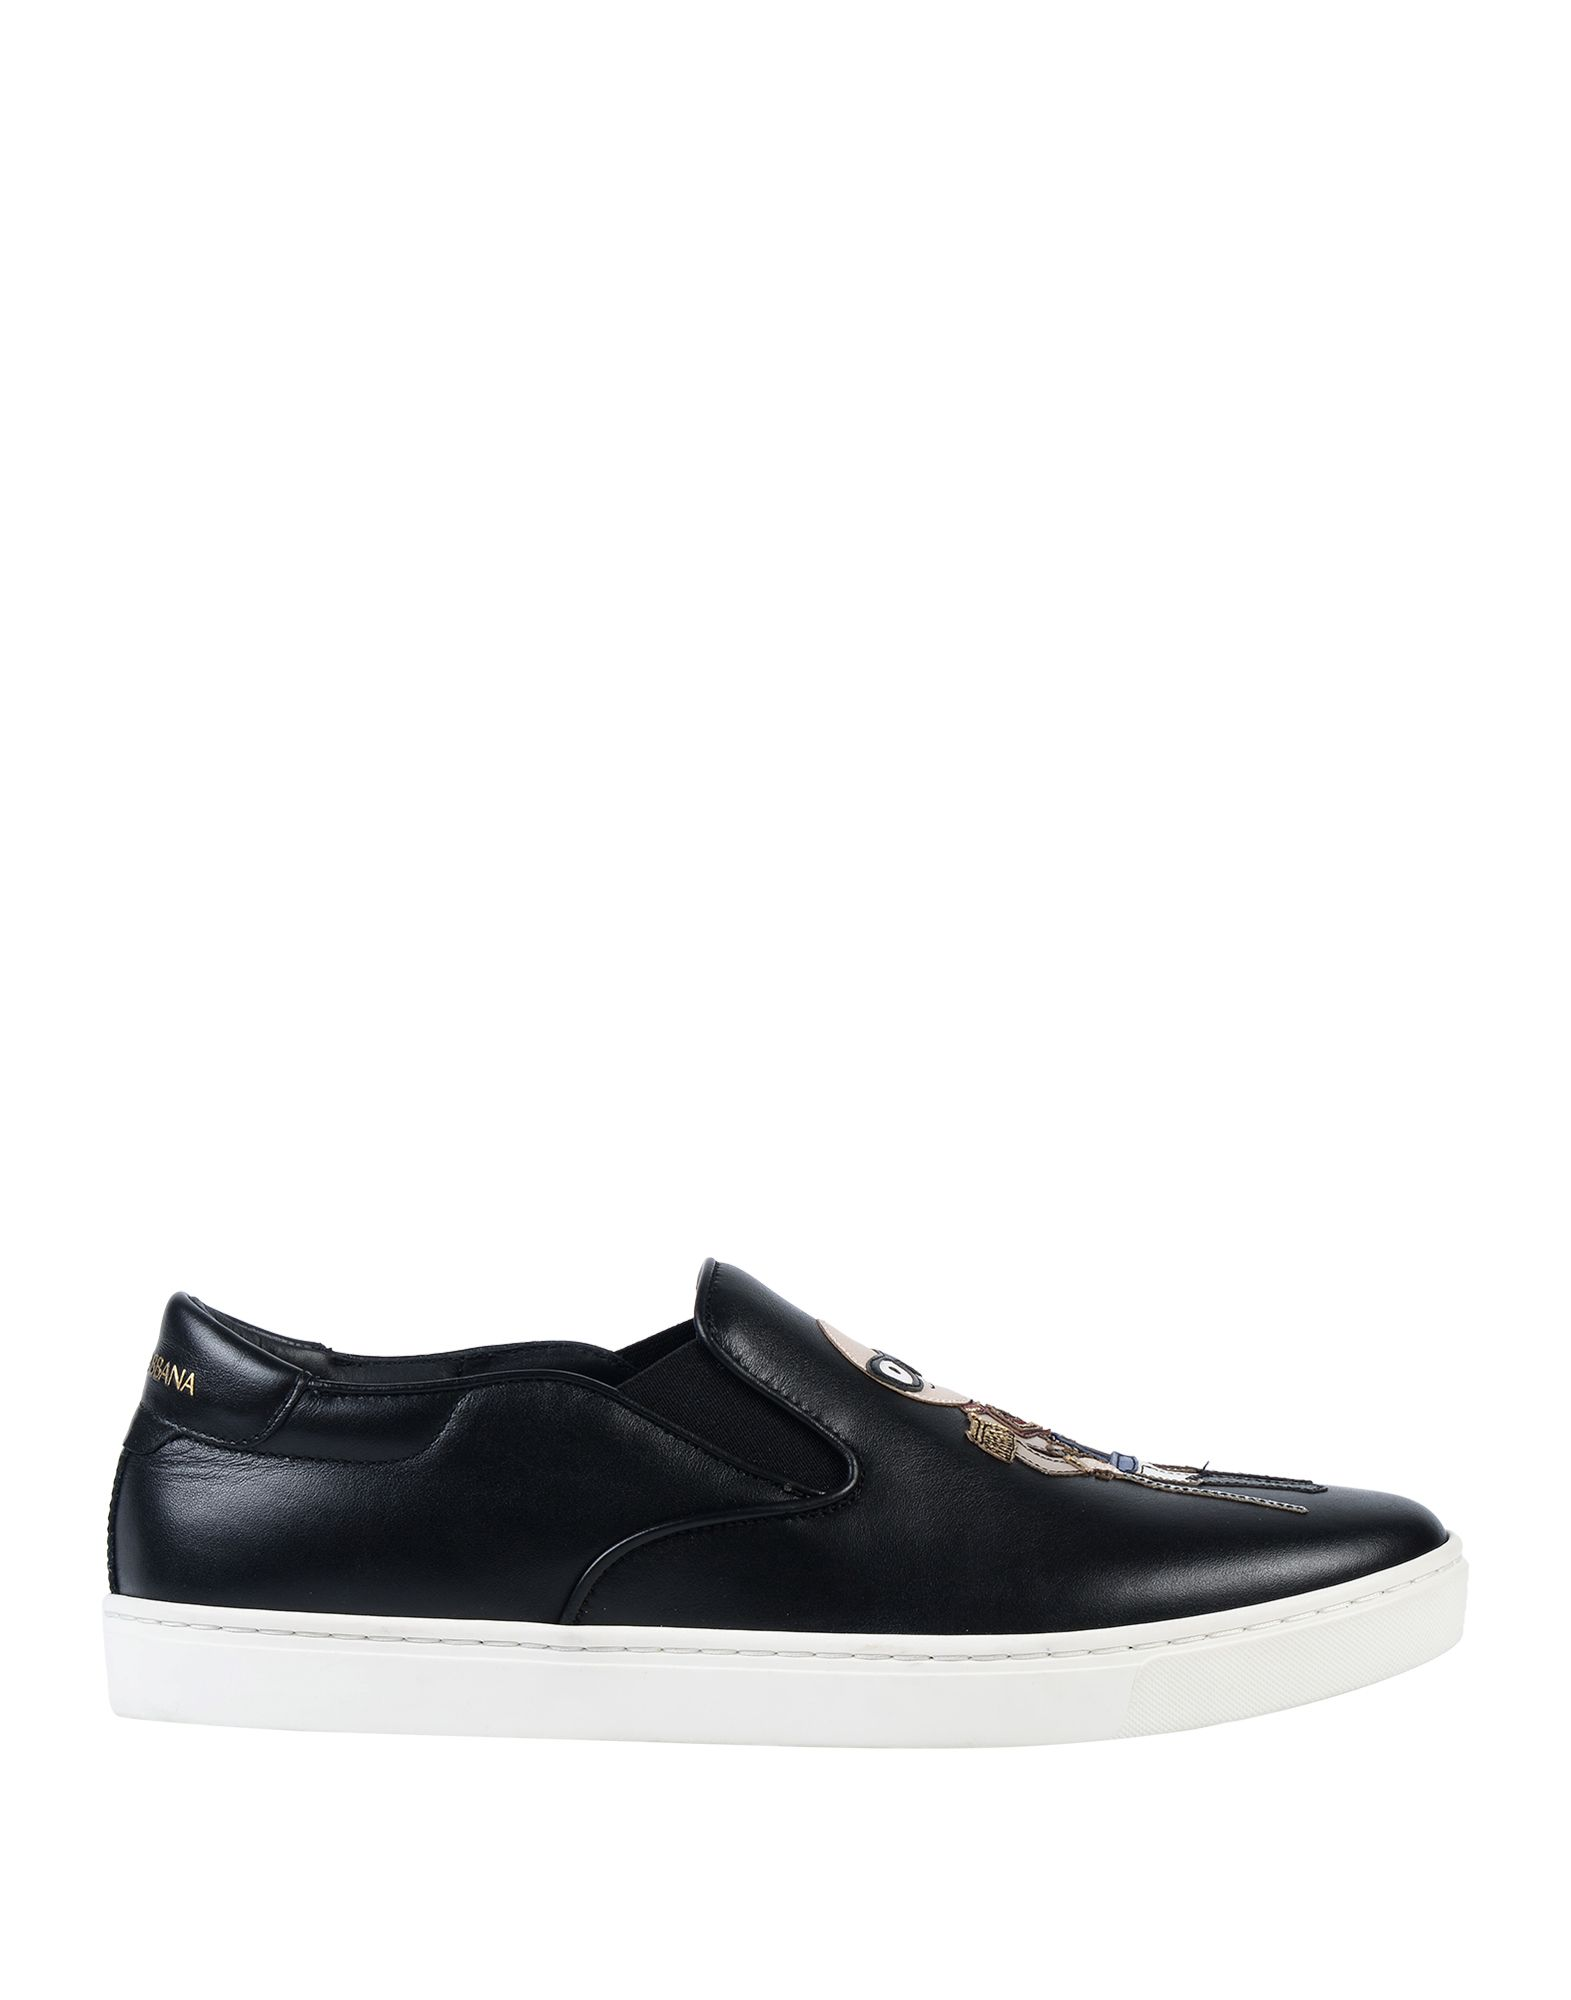 Sneakers Dolce & Gabbana Uomo - 11462013VH